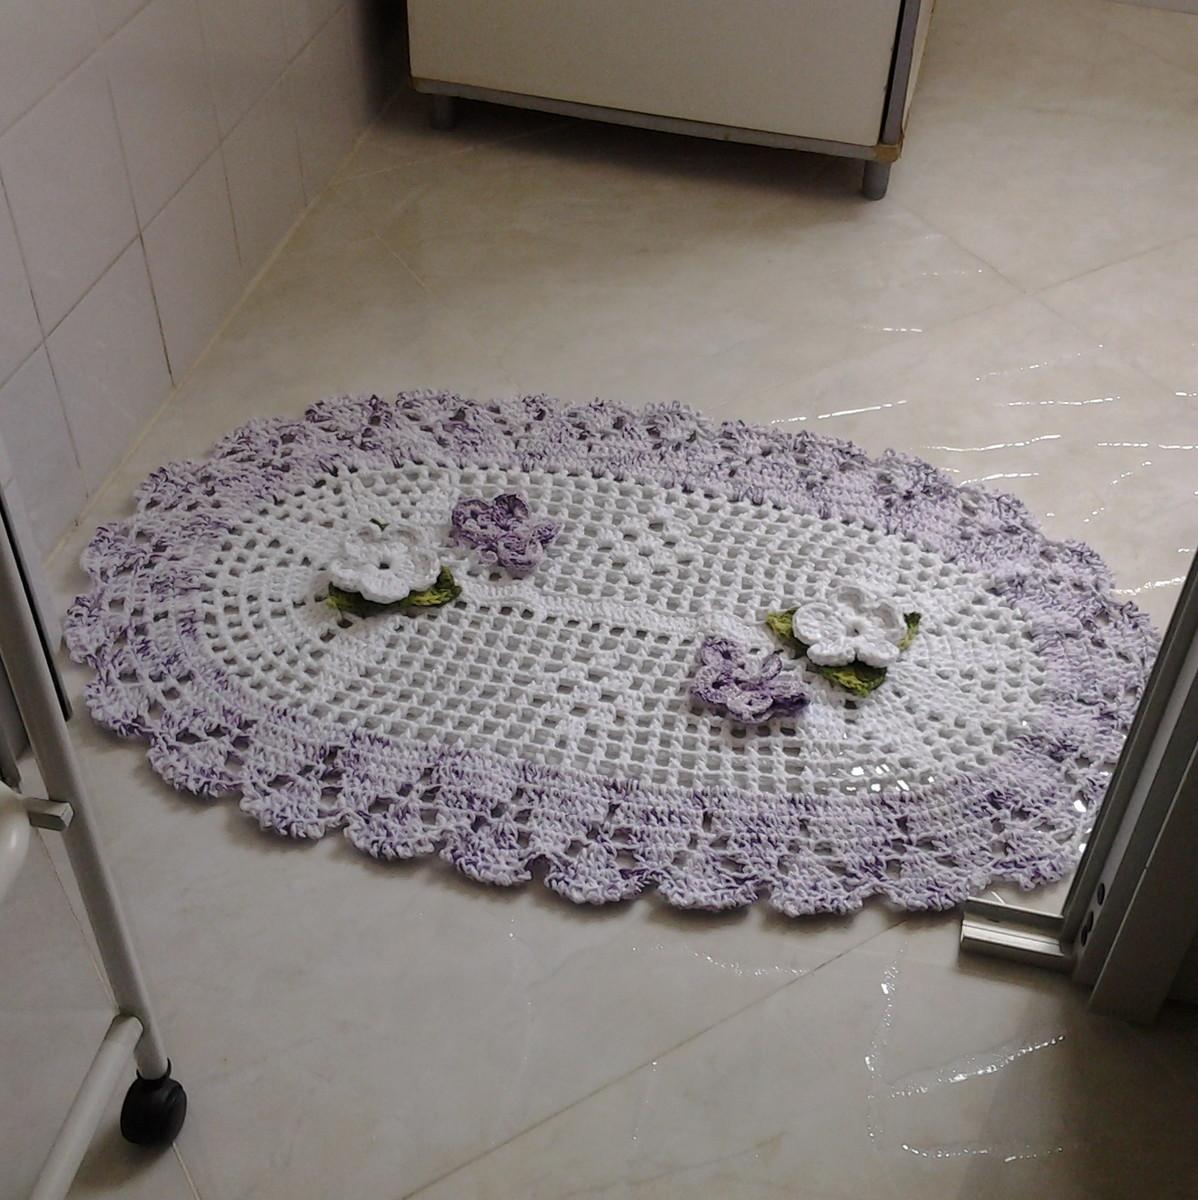 Arte Em Tapete De Barbante : tapetes-de-croche-em-barbante-artesanato tapetes-de-croche-em-barbante